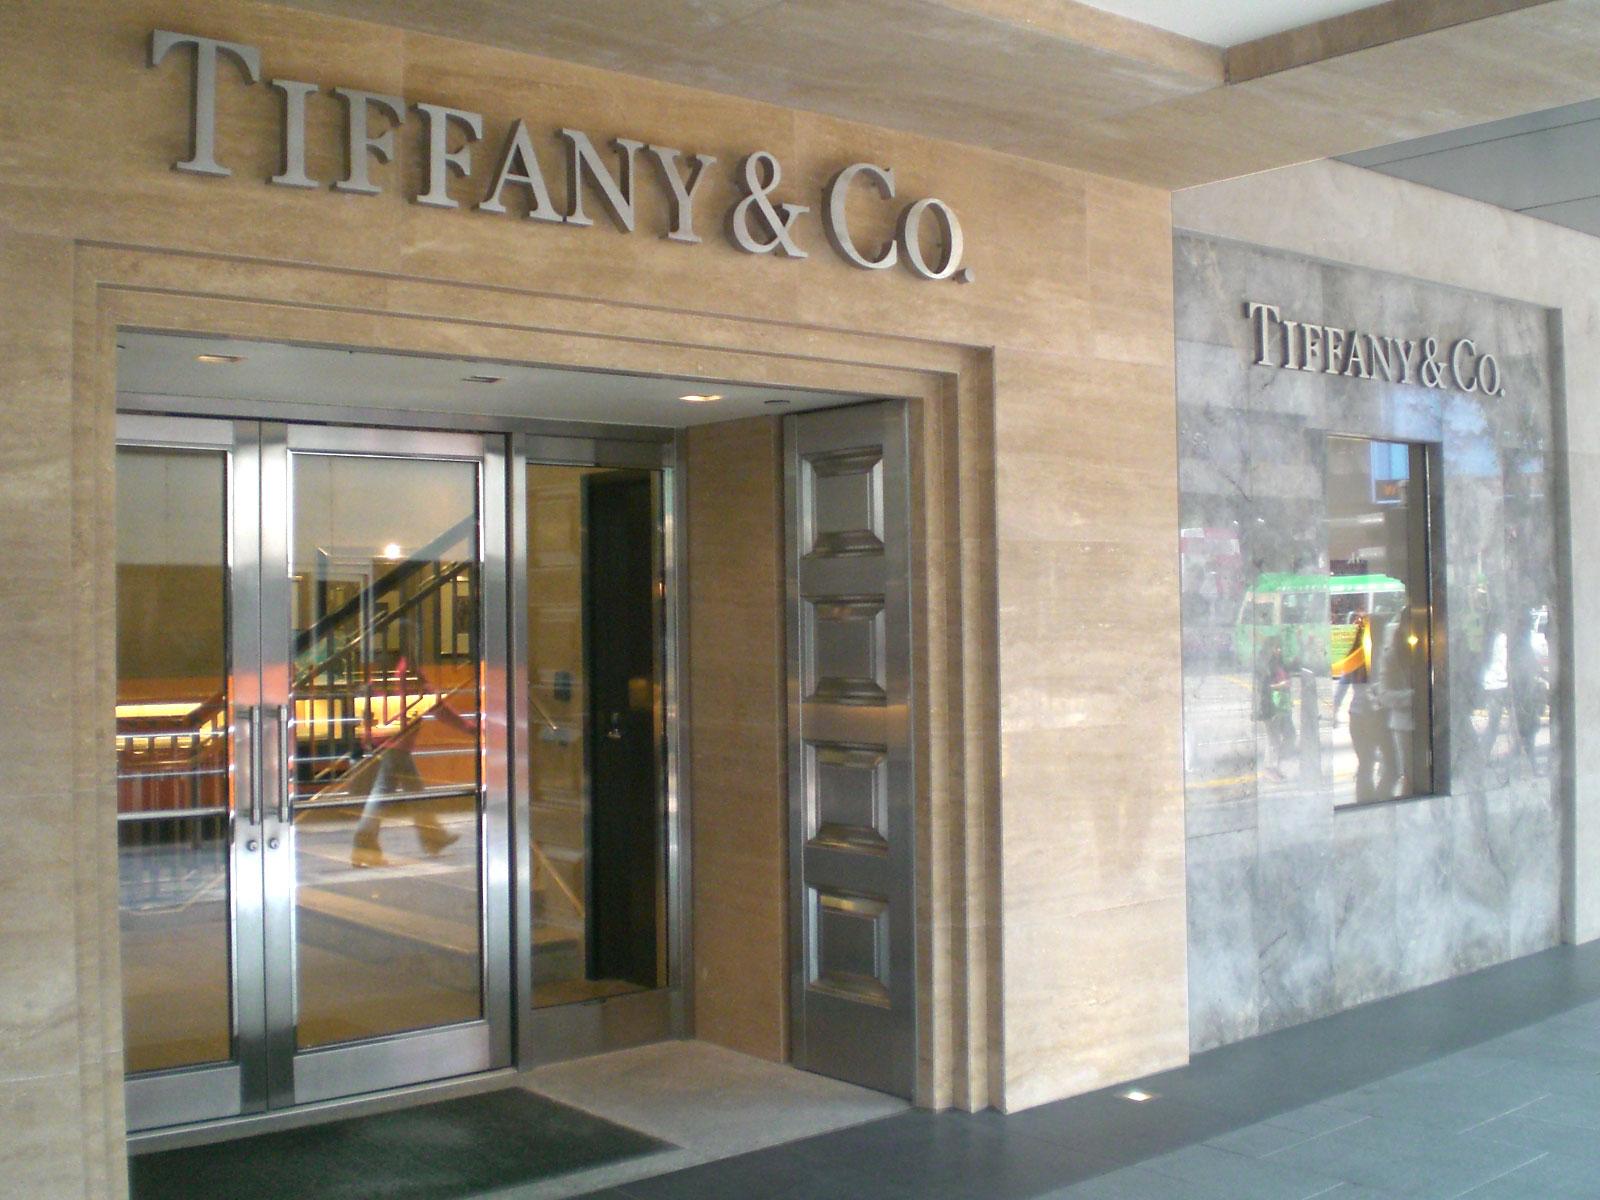 Tiffany Ring Size Chart: HK Central Landmark Mall Tiffany 6 Co a.jpg - Wikimedia Commons,Chart